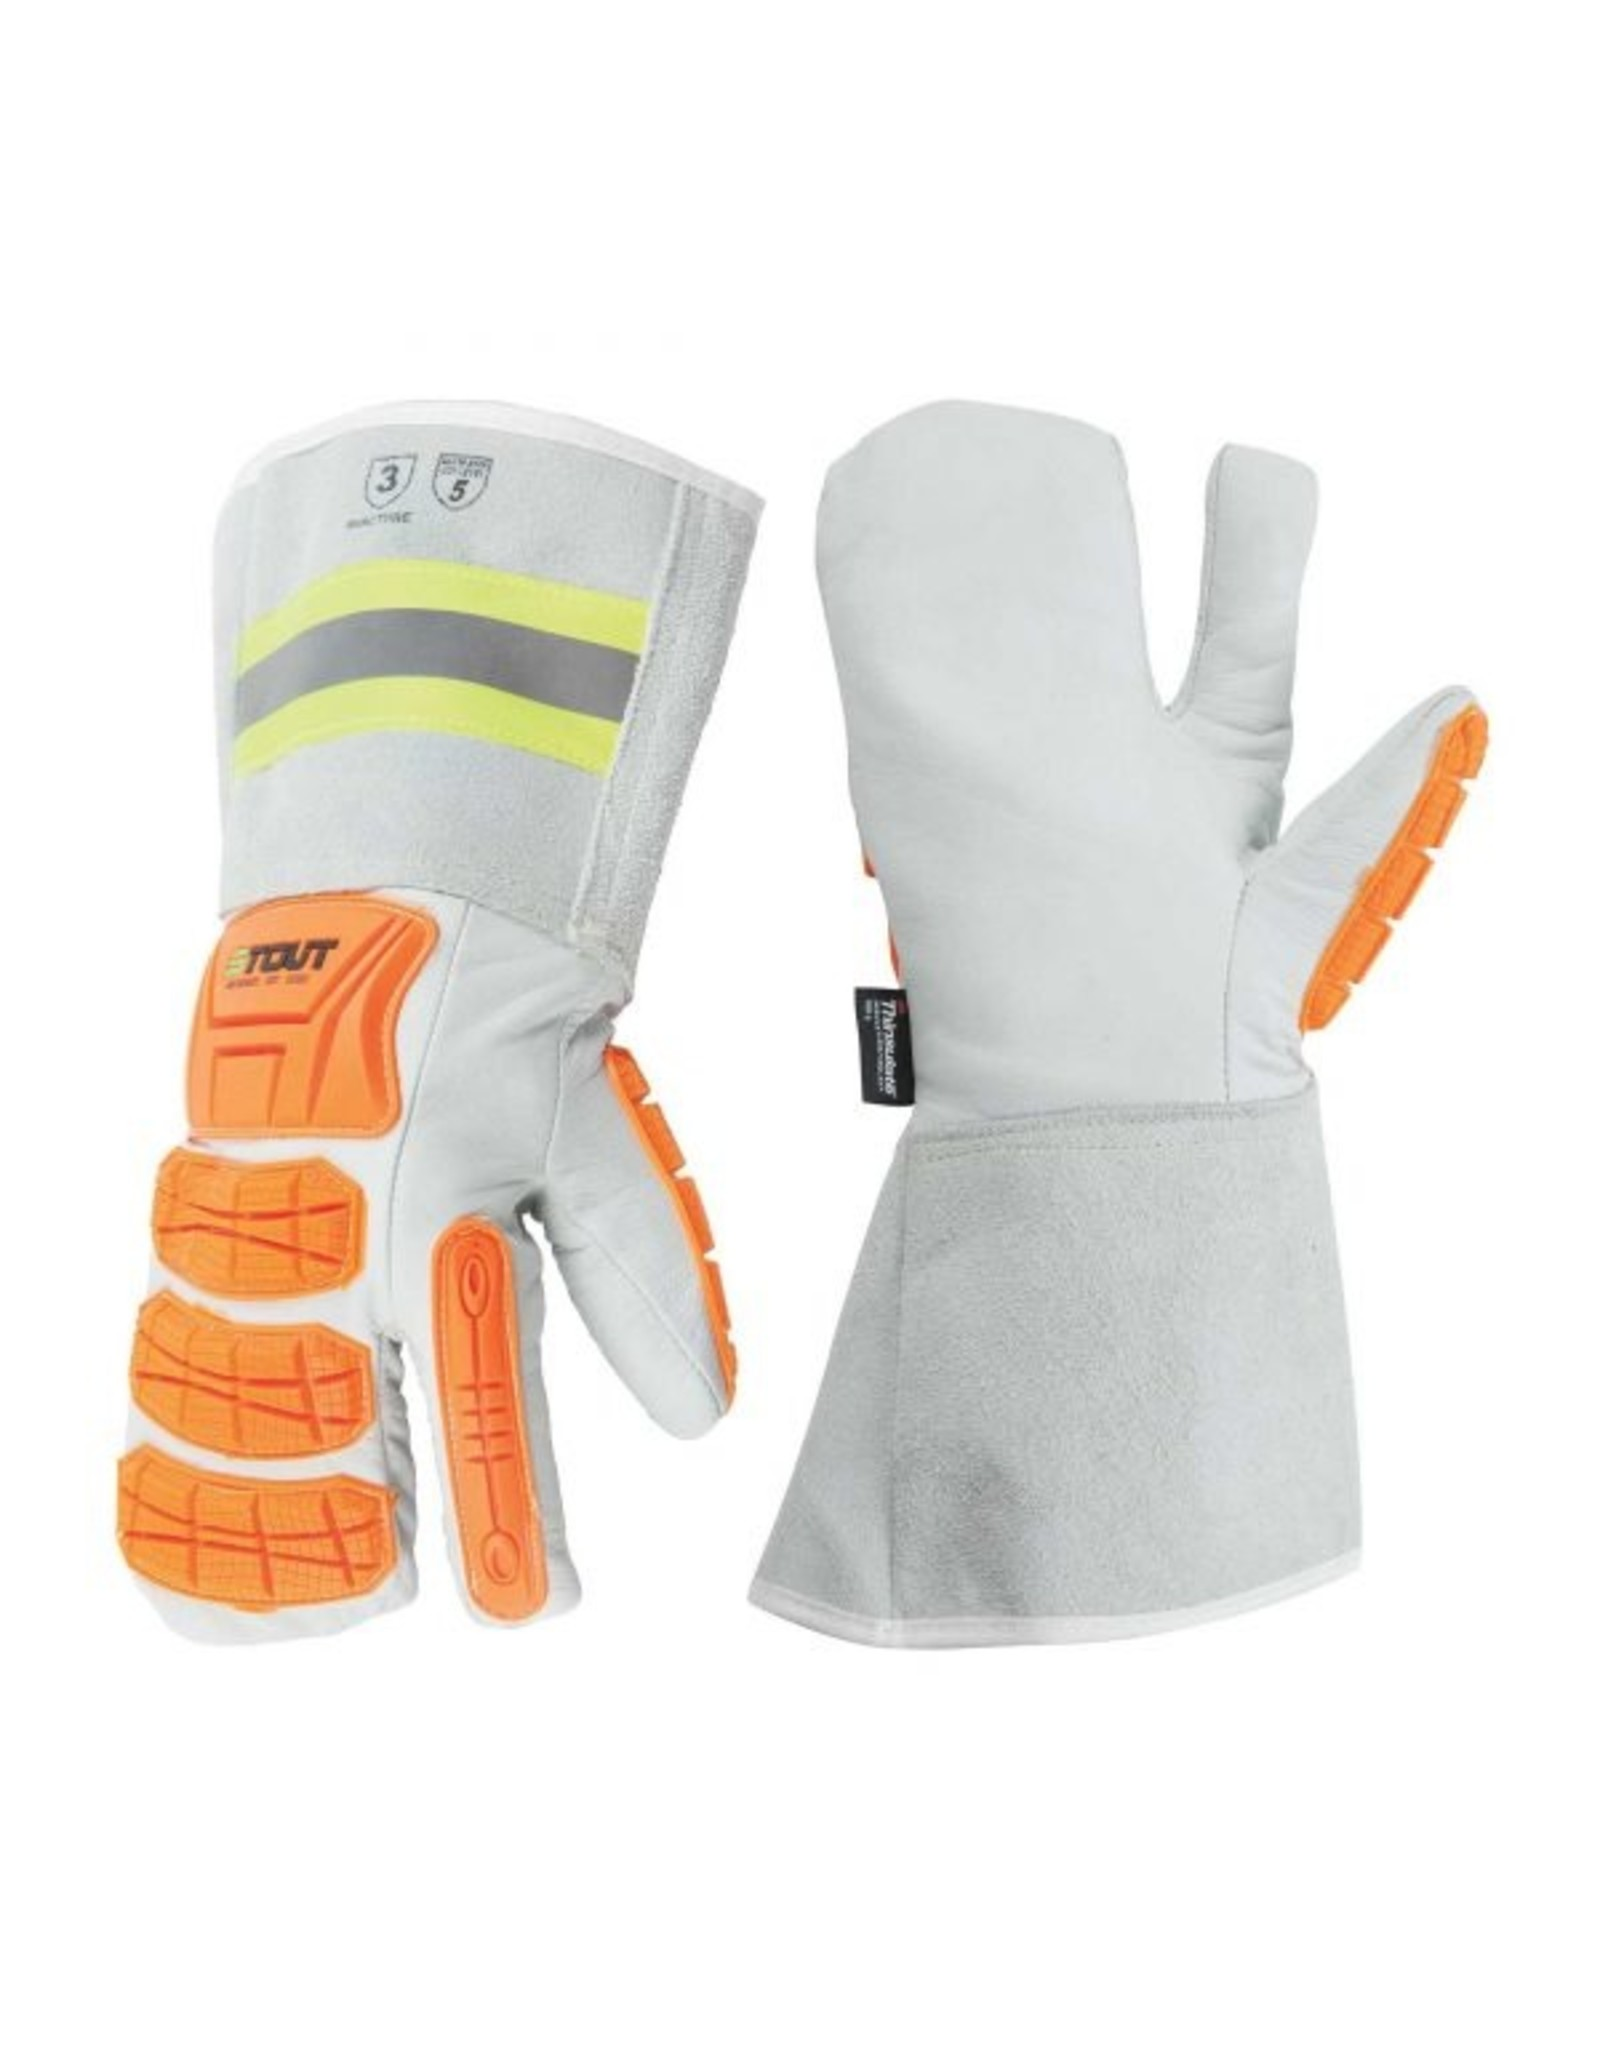 Platinum winter mitt, impact protection, ANSI cut 5, with C100 thinsulate + fleece